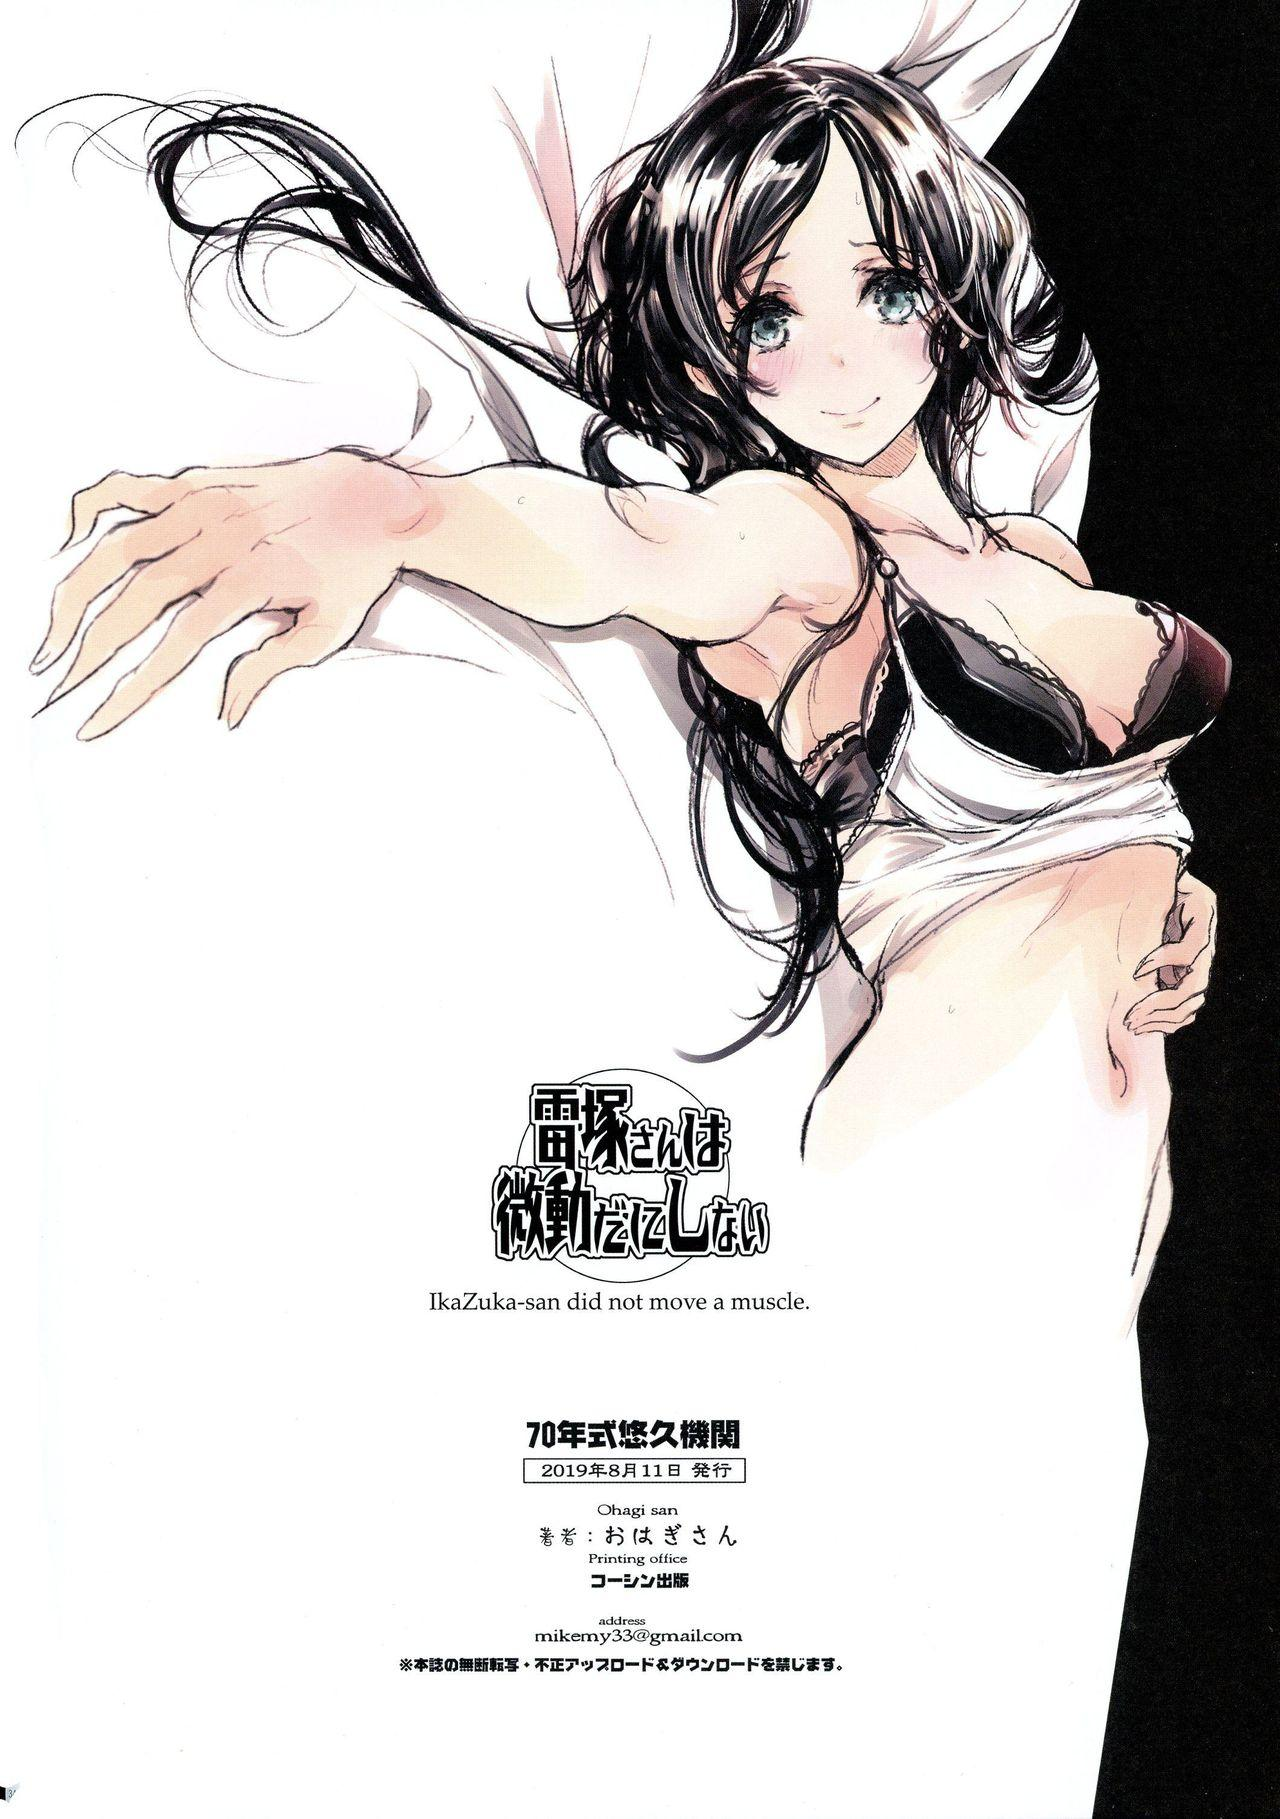 IkaZuka-san did not move a muscle 33